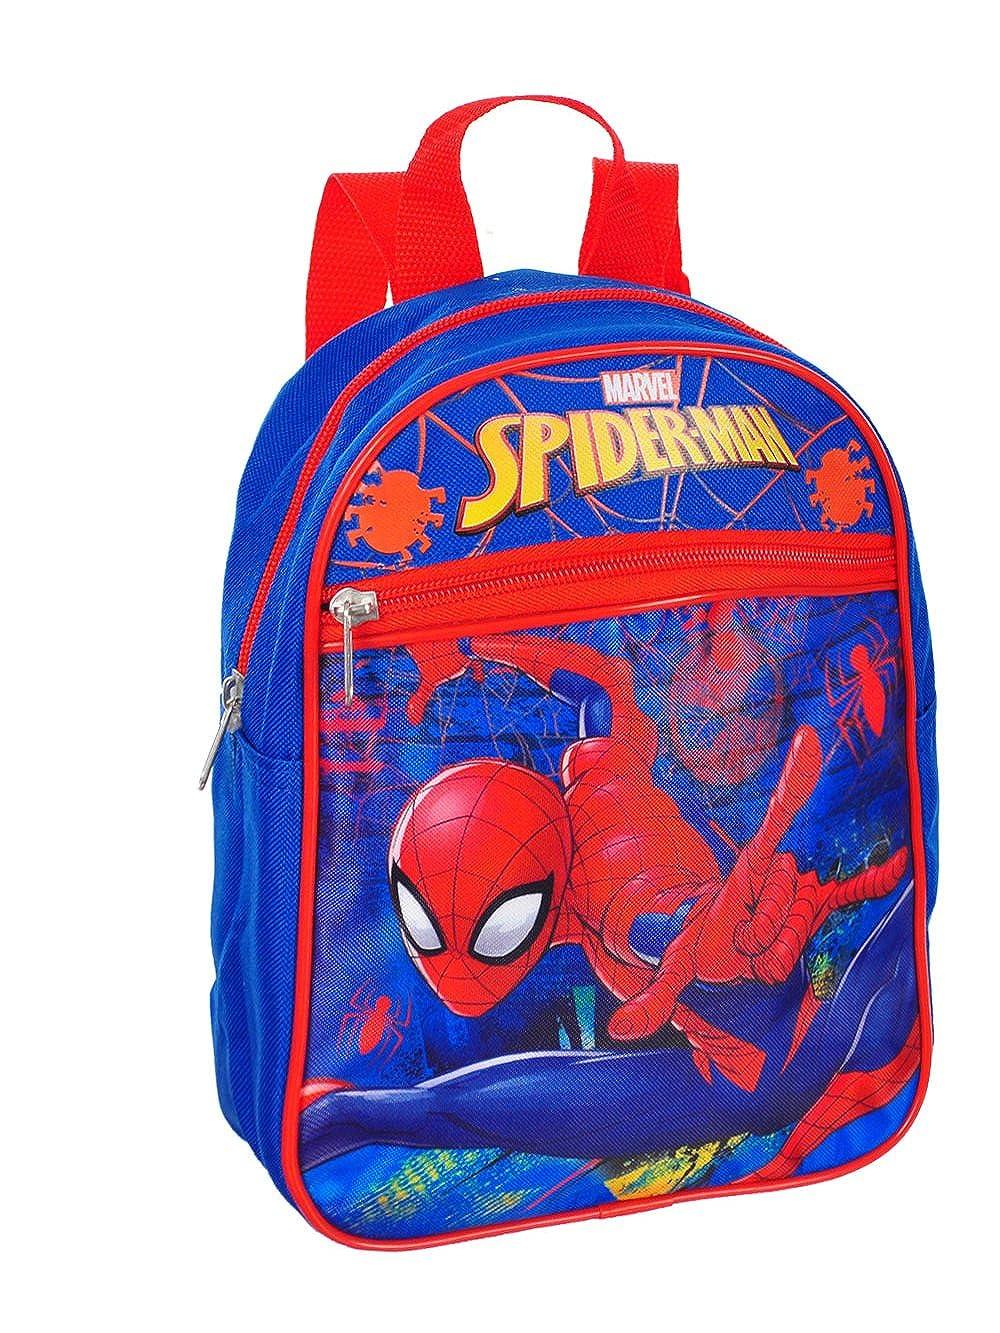 "Amazon.com: Marvel Spiderman 10"" Mini Mochila: Clothing"